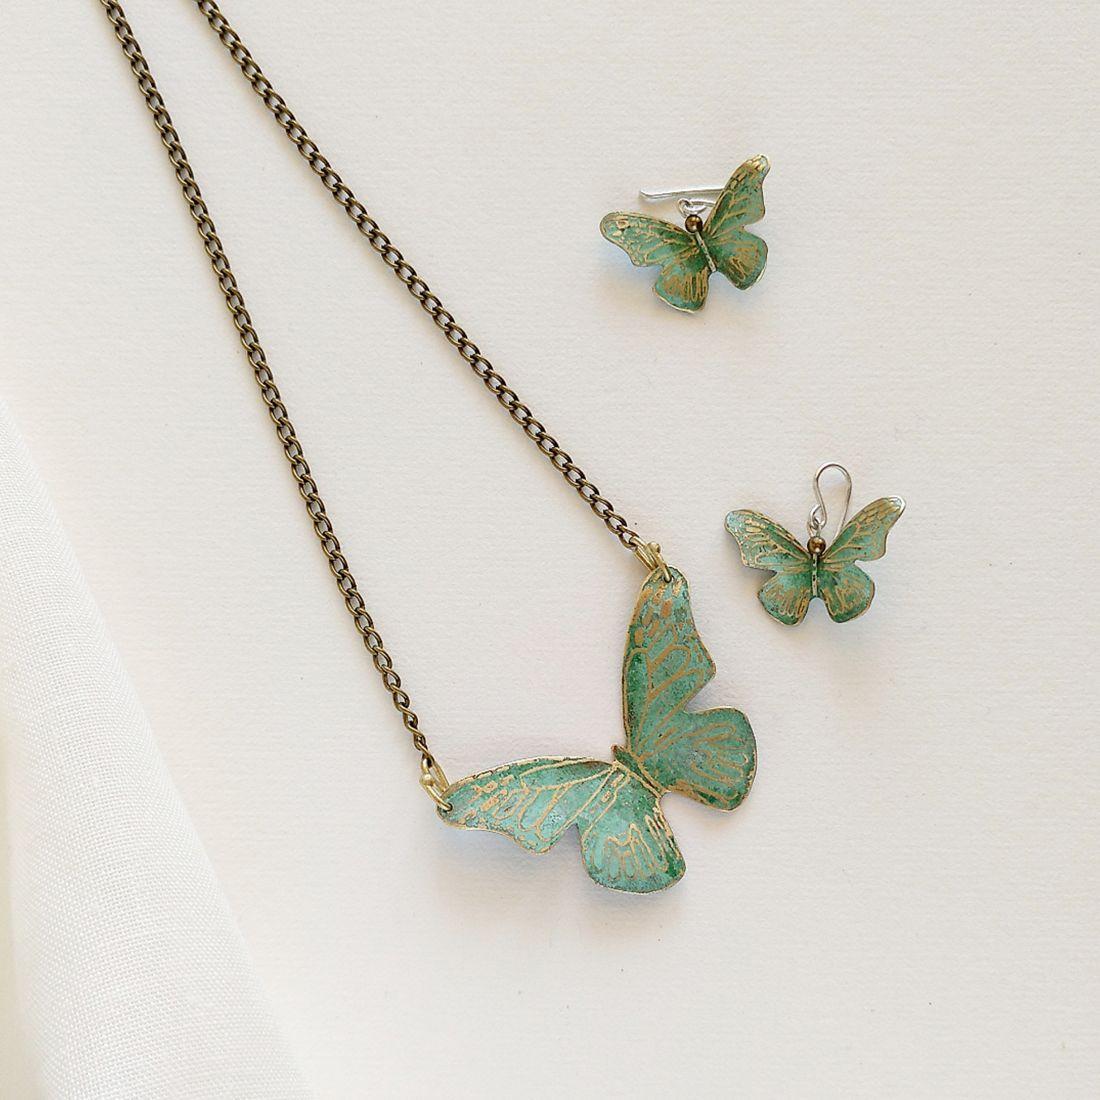 Pendientes de mariposa.joyeriacreativa